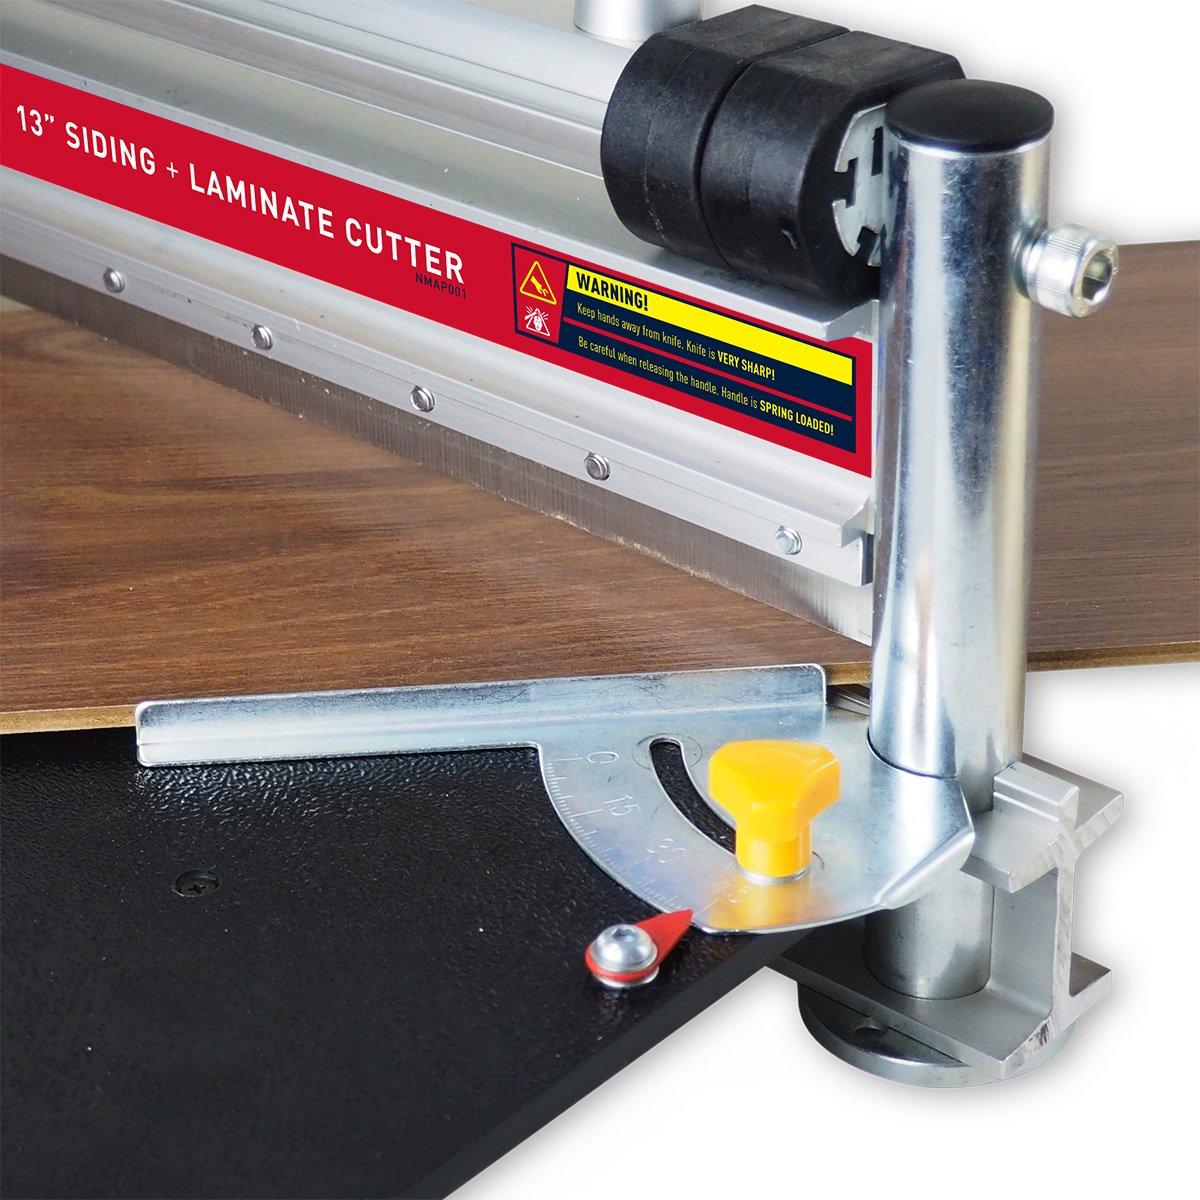 7 Best Laminate Floor Cutters That Cut Laminates Quickly